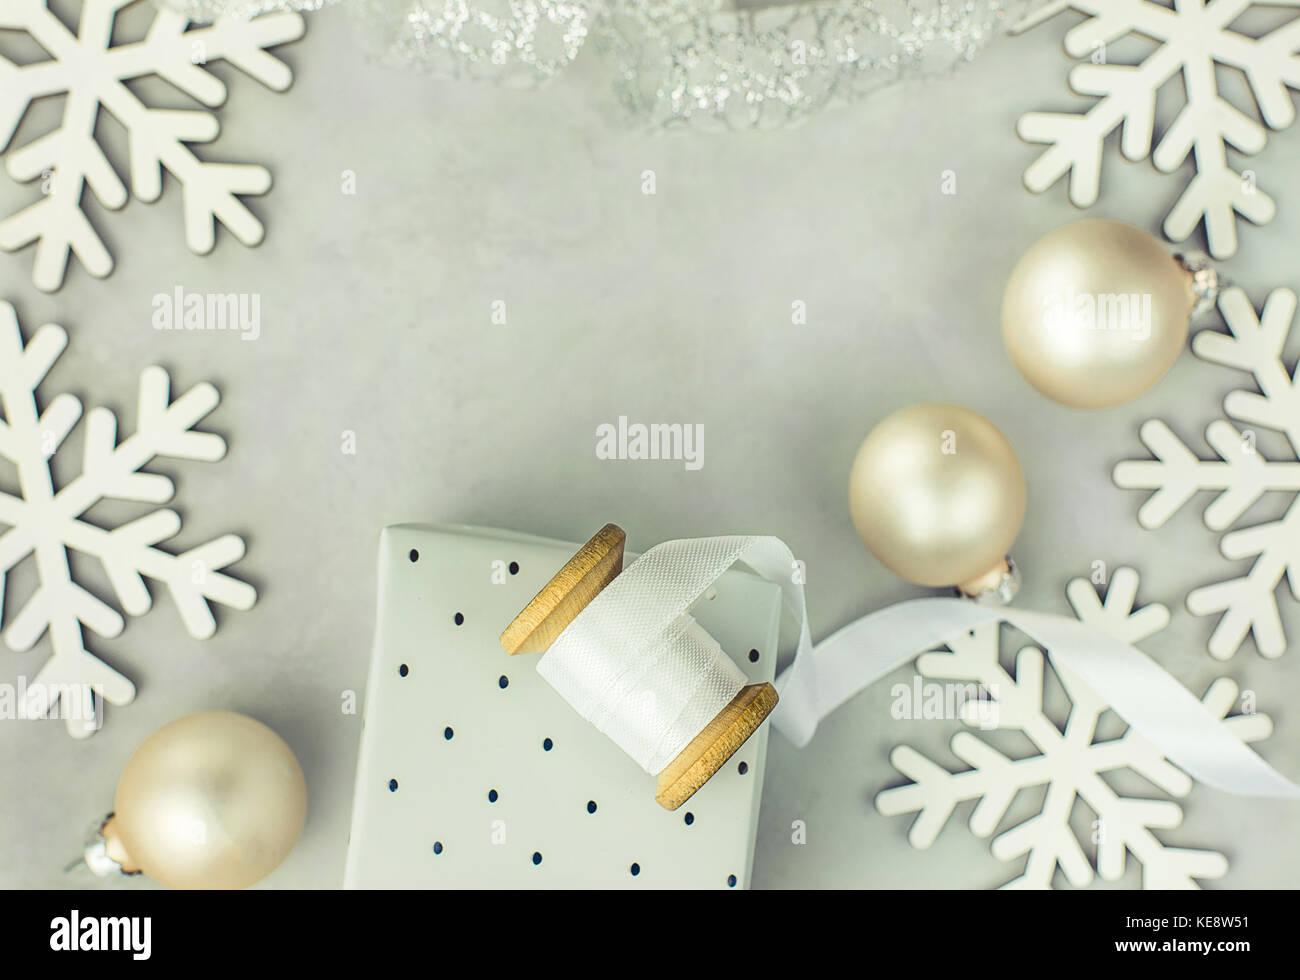 Geschenkboxen in Silber Papier gewickelt. Holz- Schieber mit Weiß gewellt Seidenband, Christbaumkugeln, Schneeflocken Stockbild